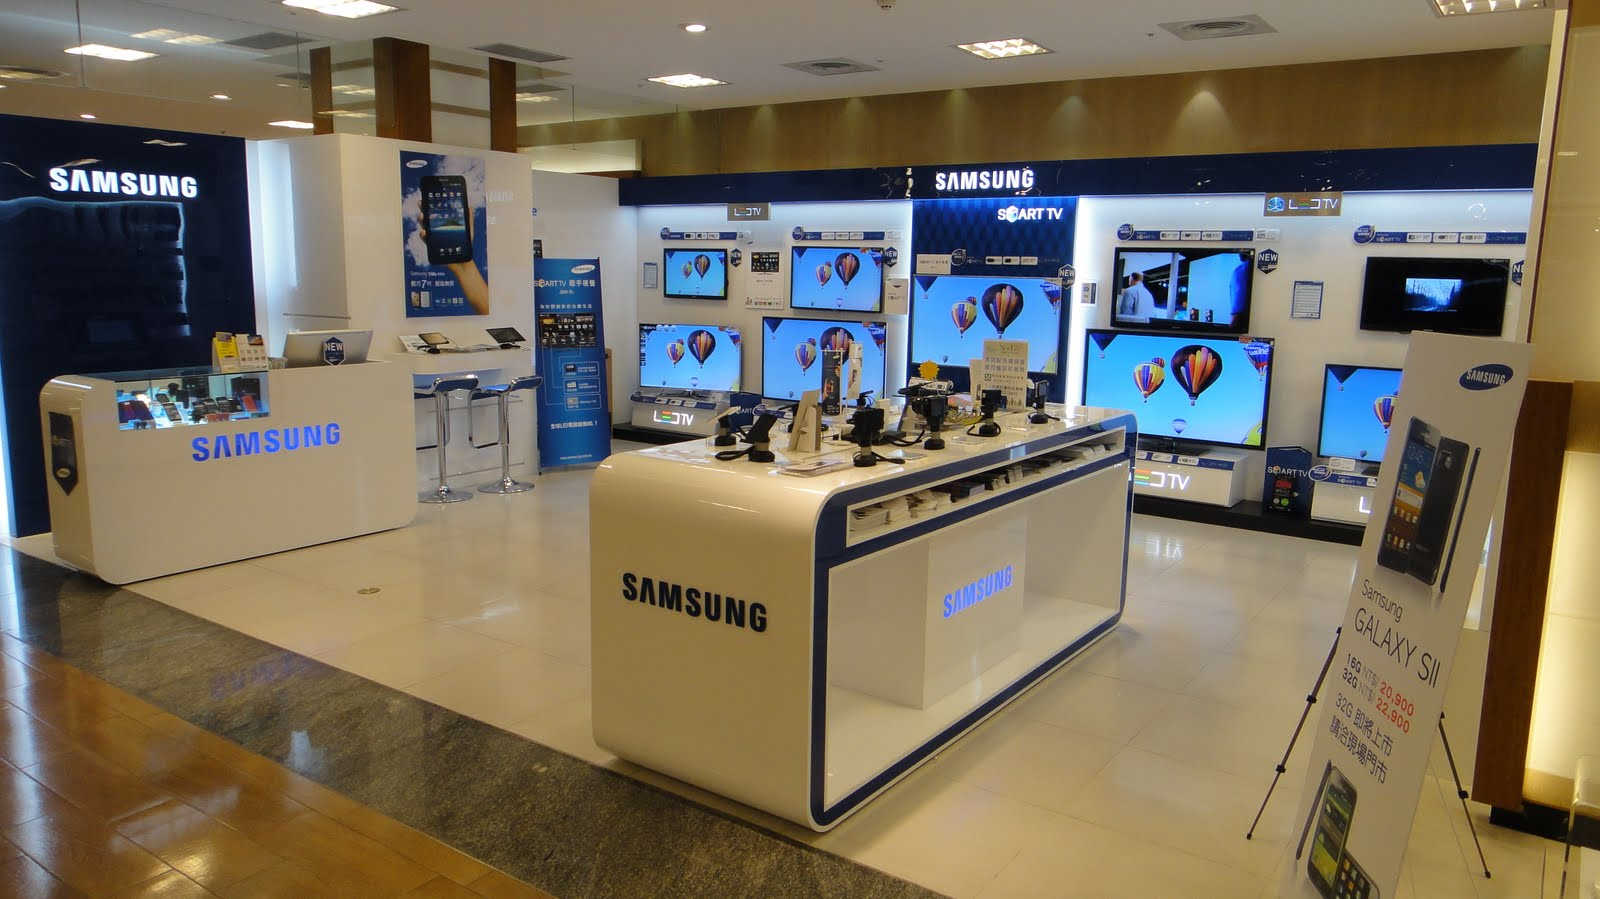 SamsungVIP: 服務據點